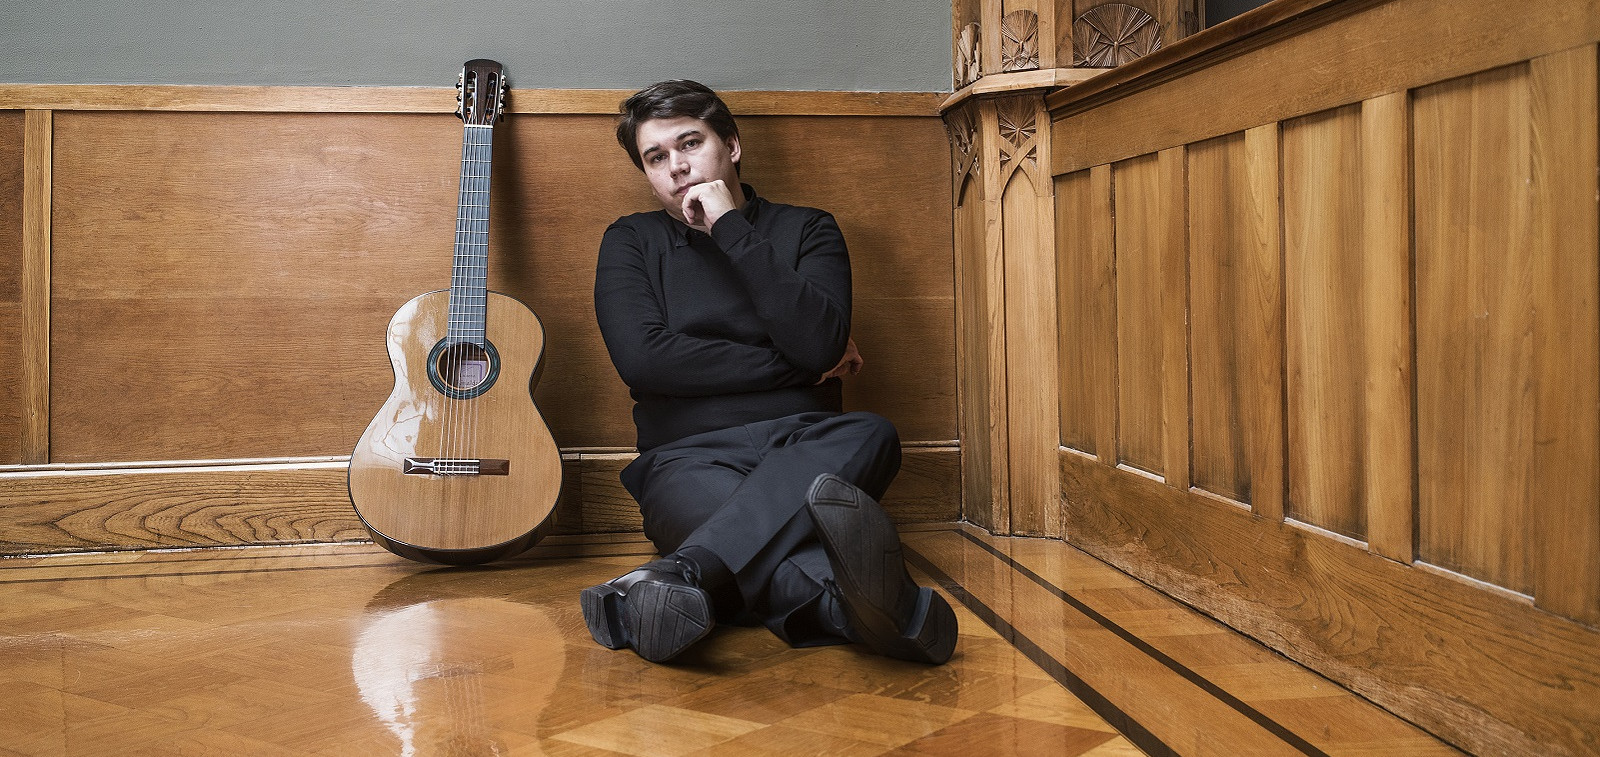 Kitaristi Patrik Kleemola